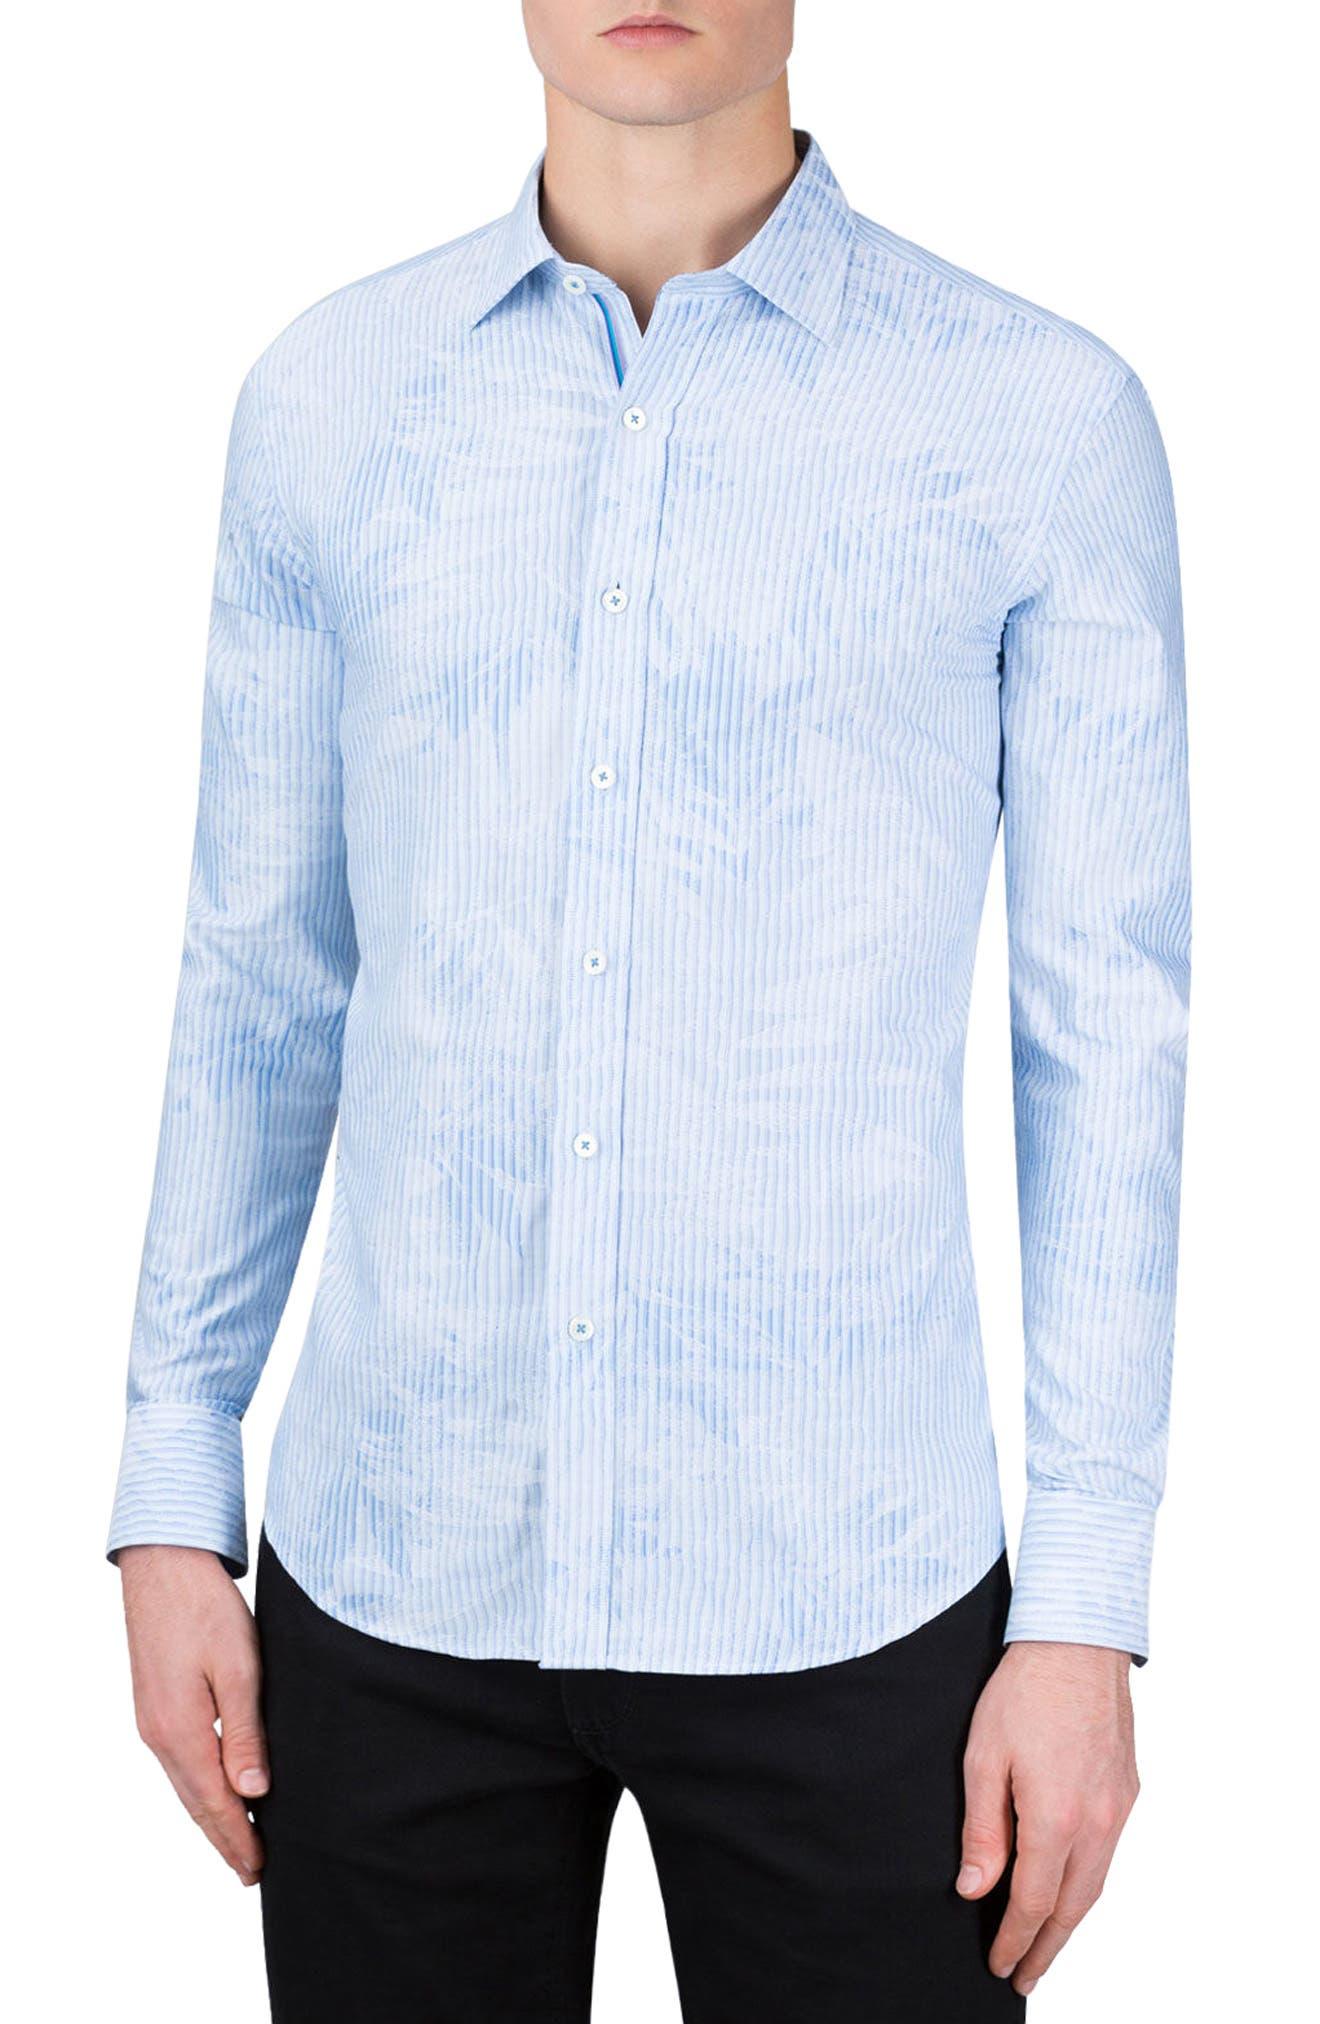 Main Image - Bugatchi Shaped Fit Floral Stripe Sport Shirt